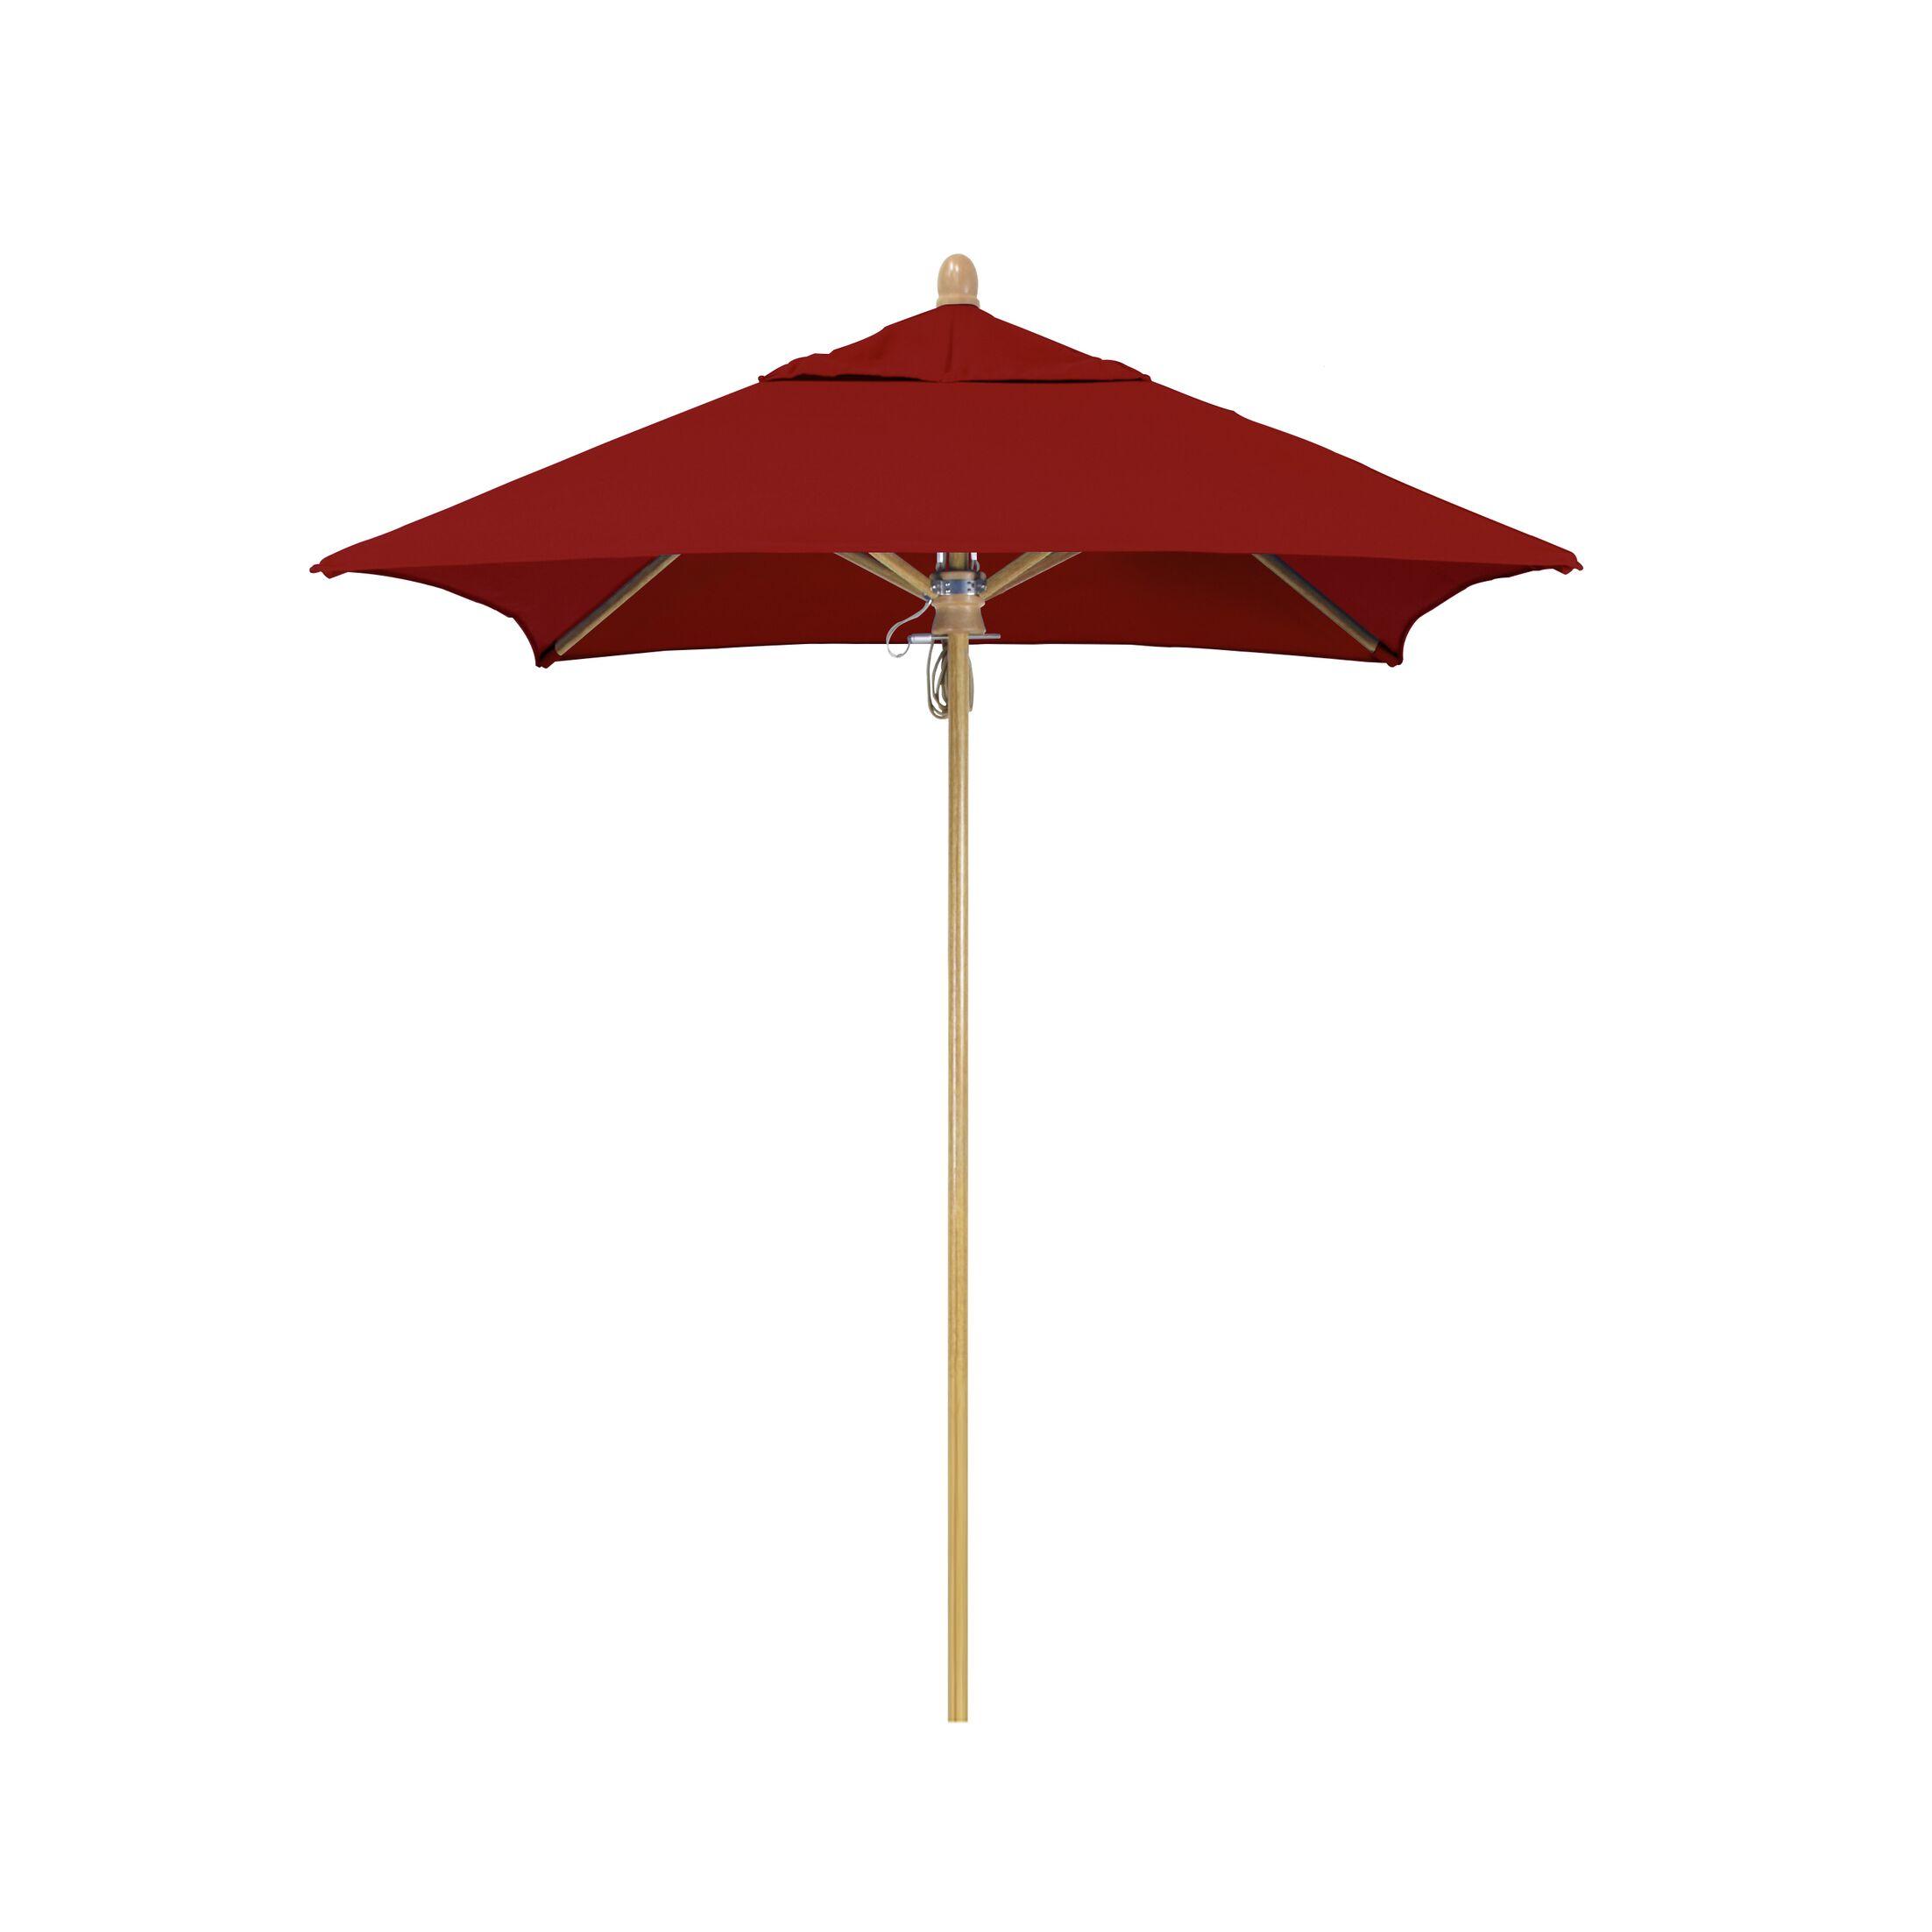 Sierra Series Patio 6' Market Umbrella Fabric Color: Red, Frame Color: White Oak